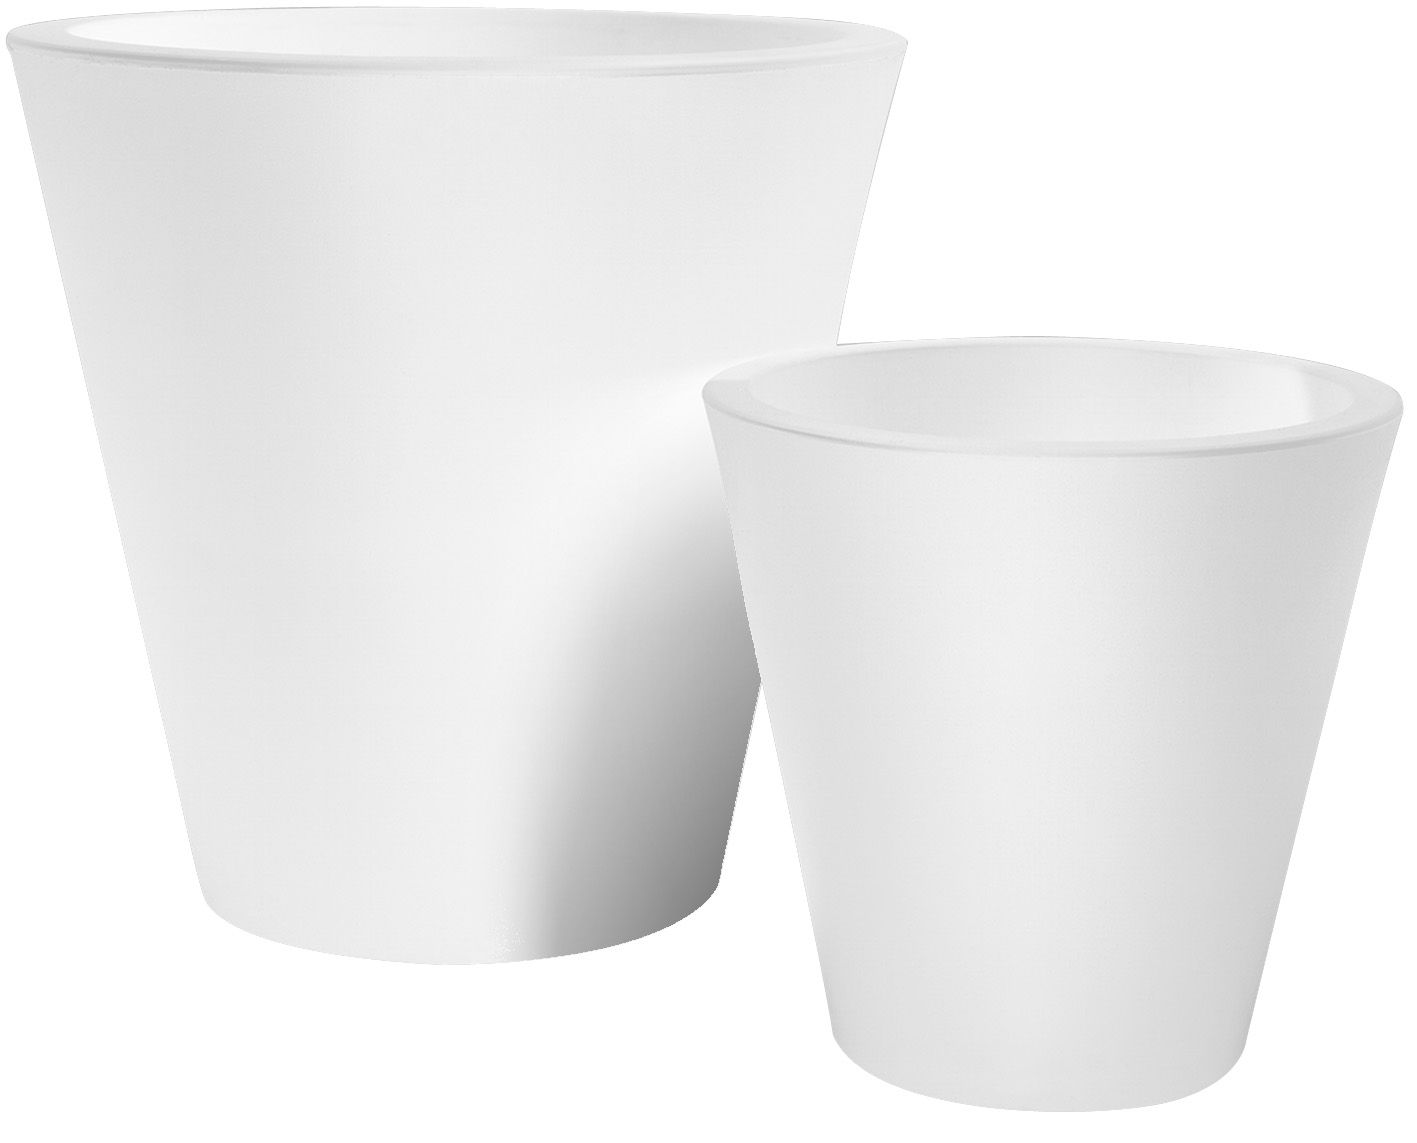 Outdoor - Töpfe und Pflanzen - New Pot Blumentopf H 50 cm - Serralunga - Weiß - Polyäthylen